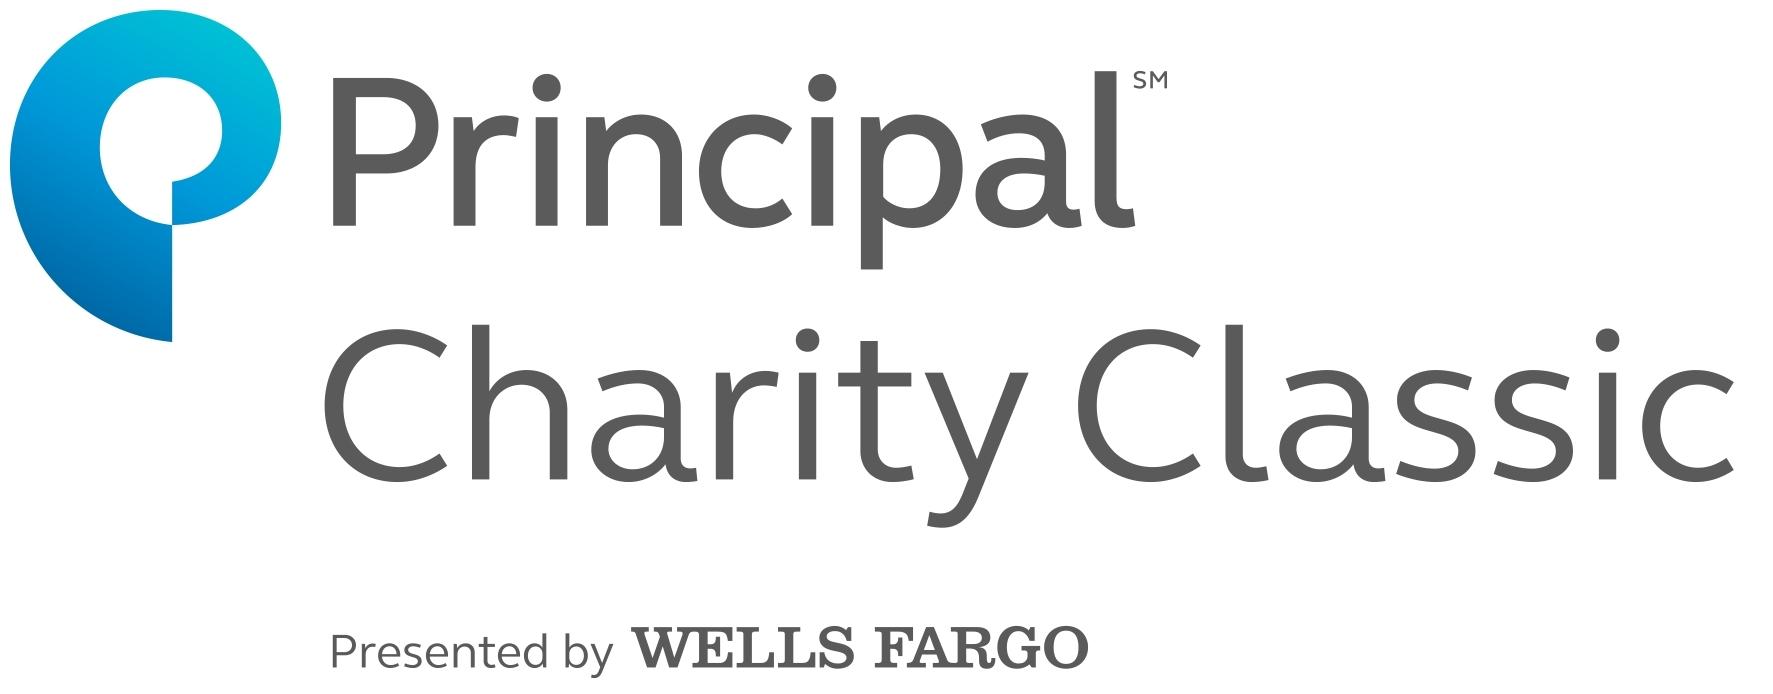 Principal Charity Classic